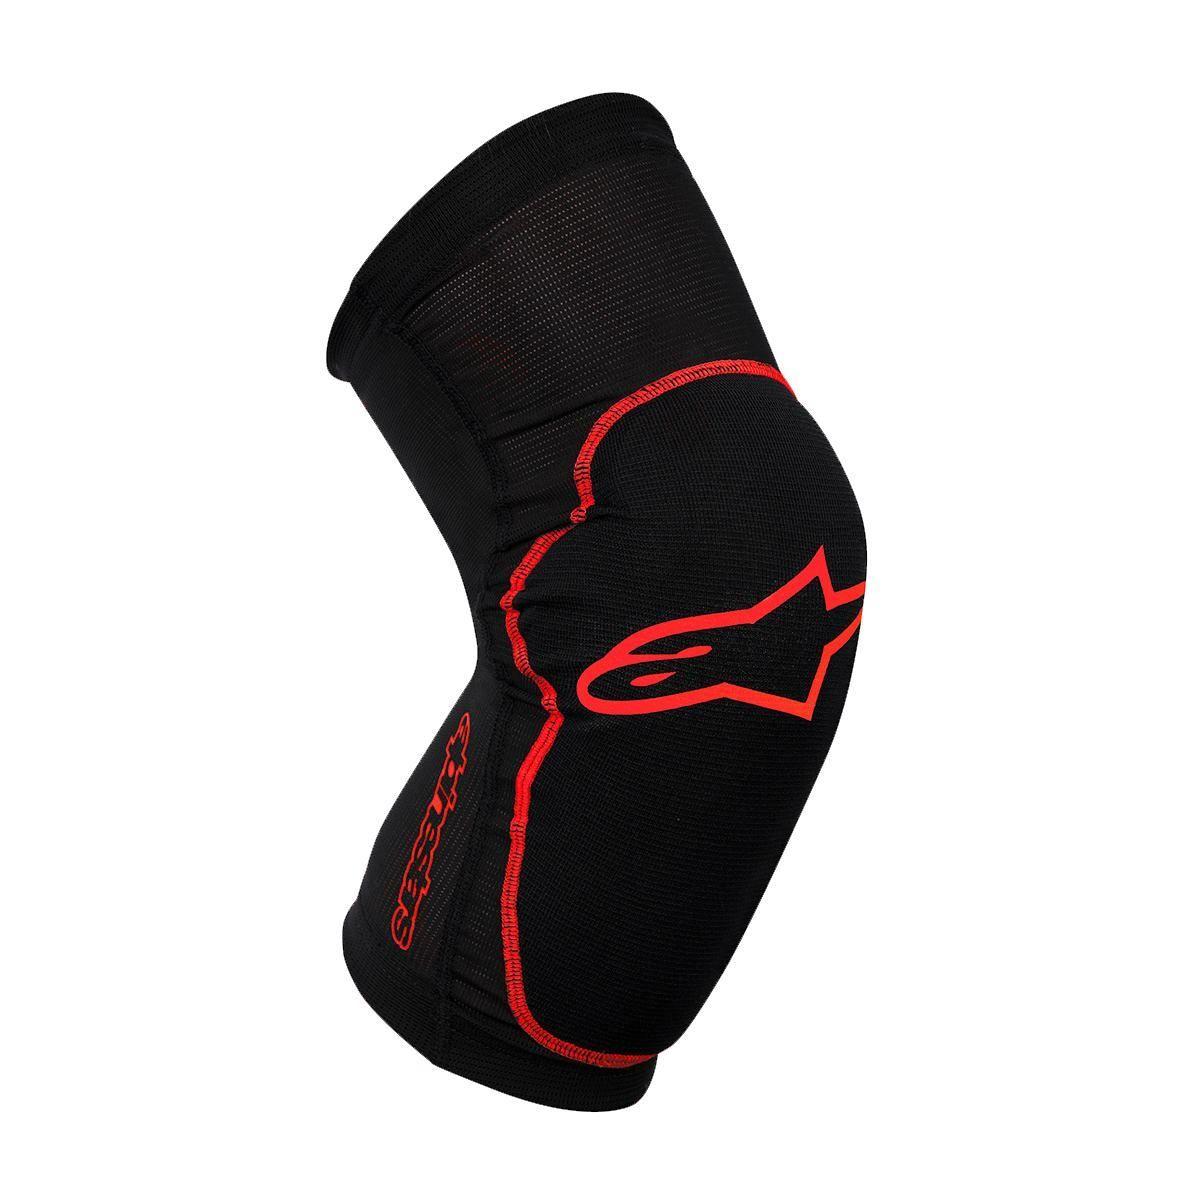 Alpinestars Protection Paragon Knee Guard 2017: Black/Red L